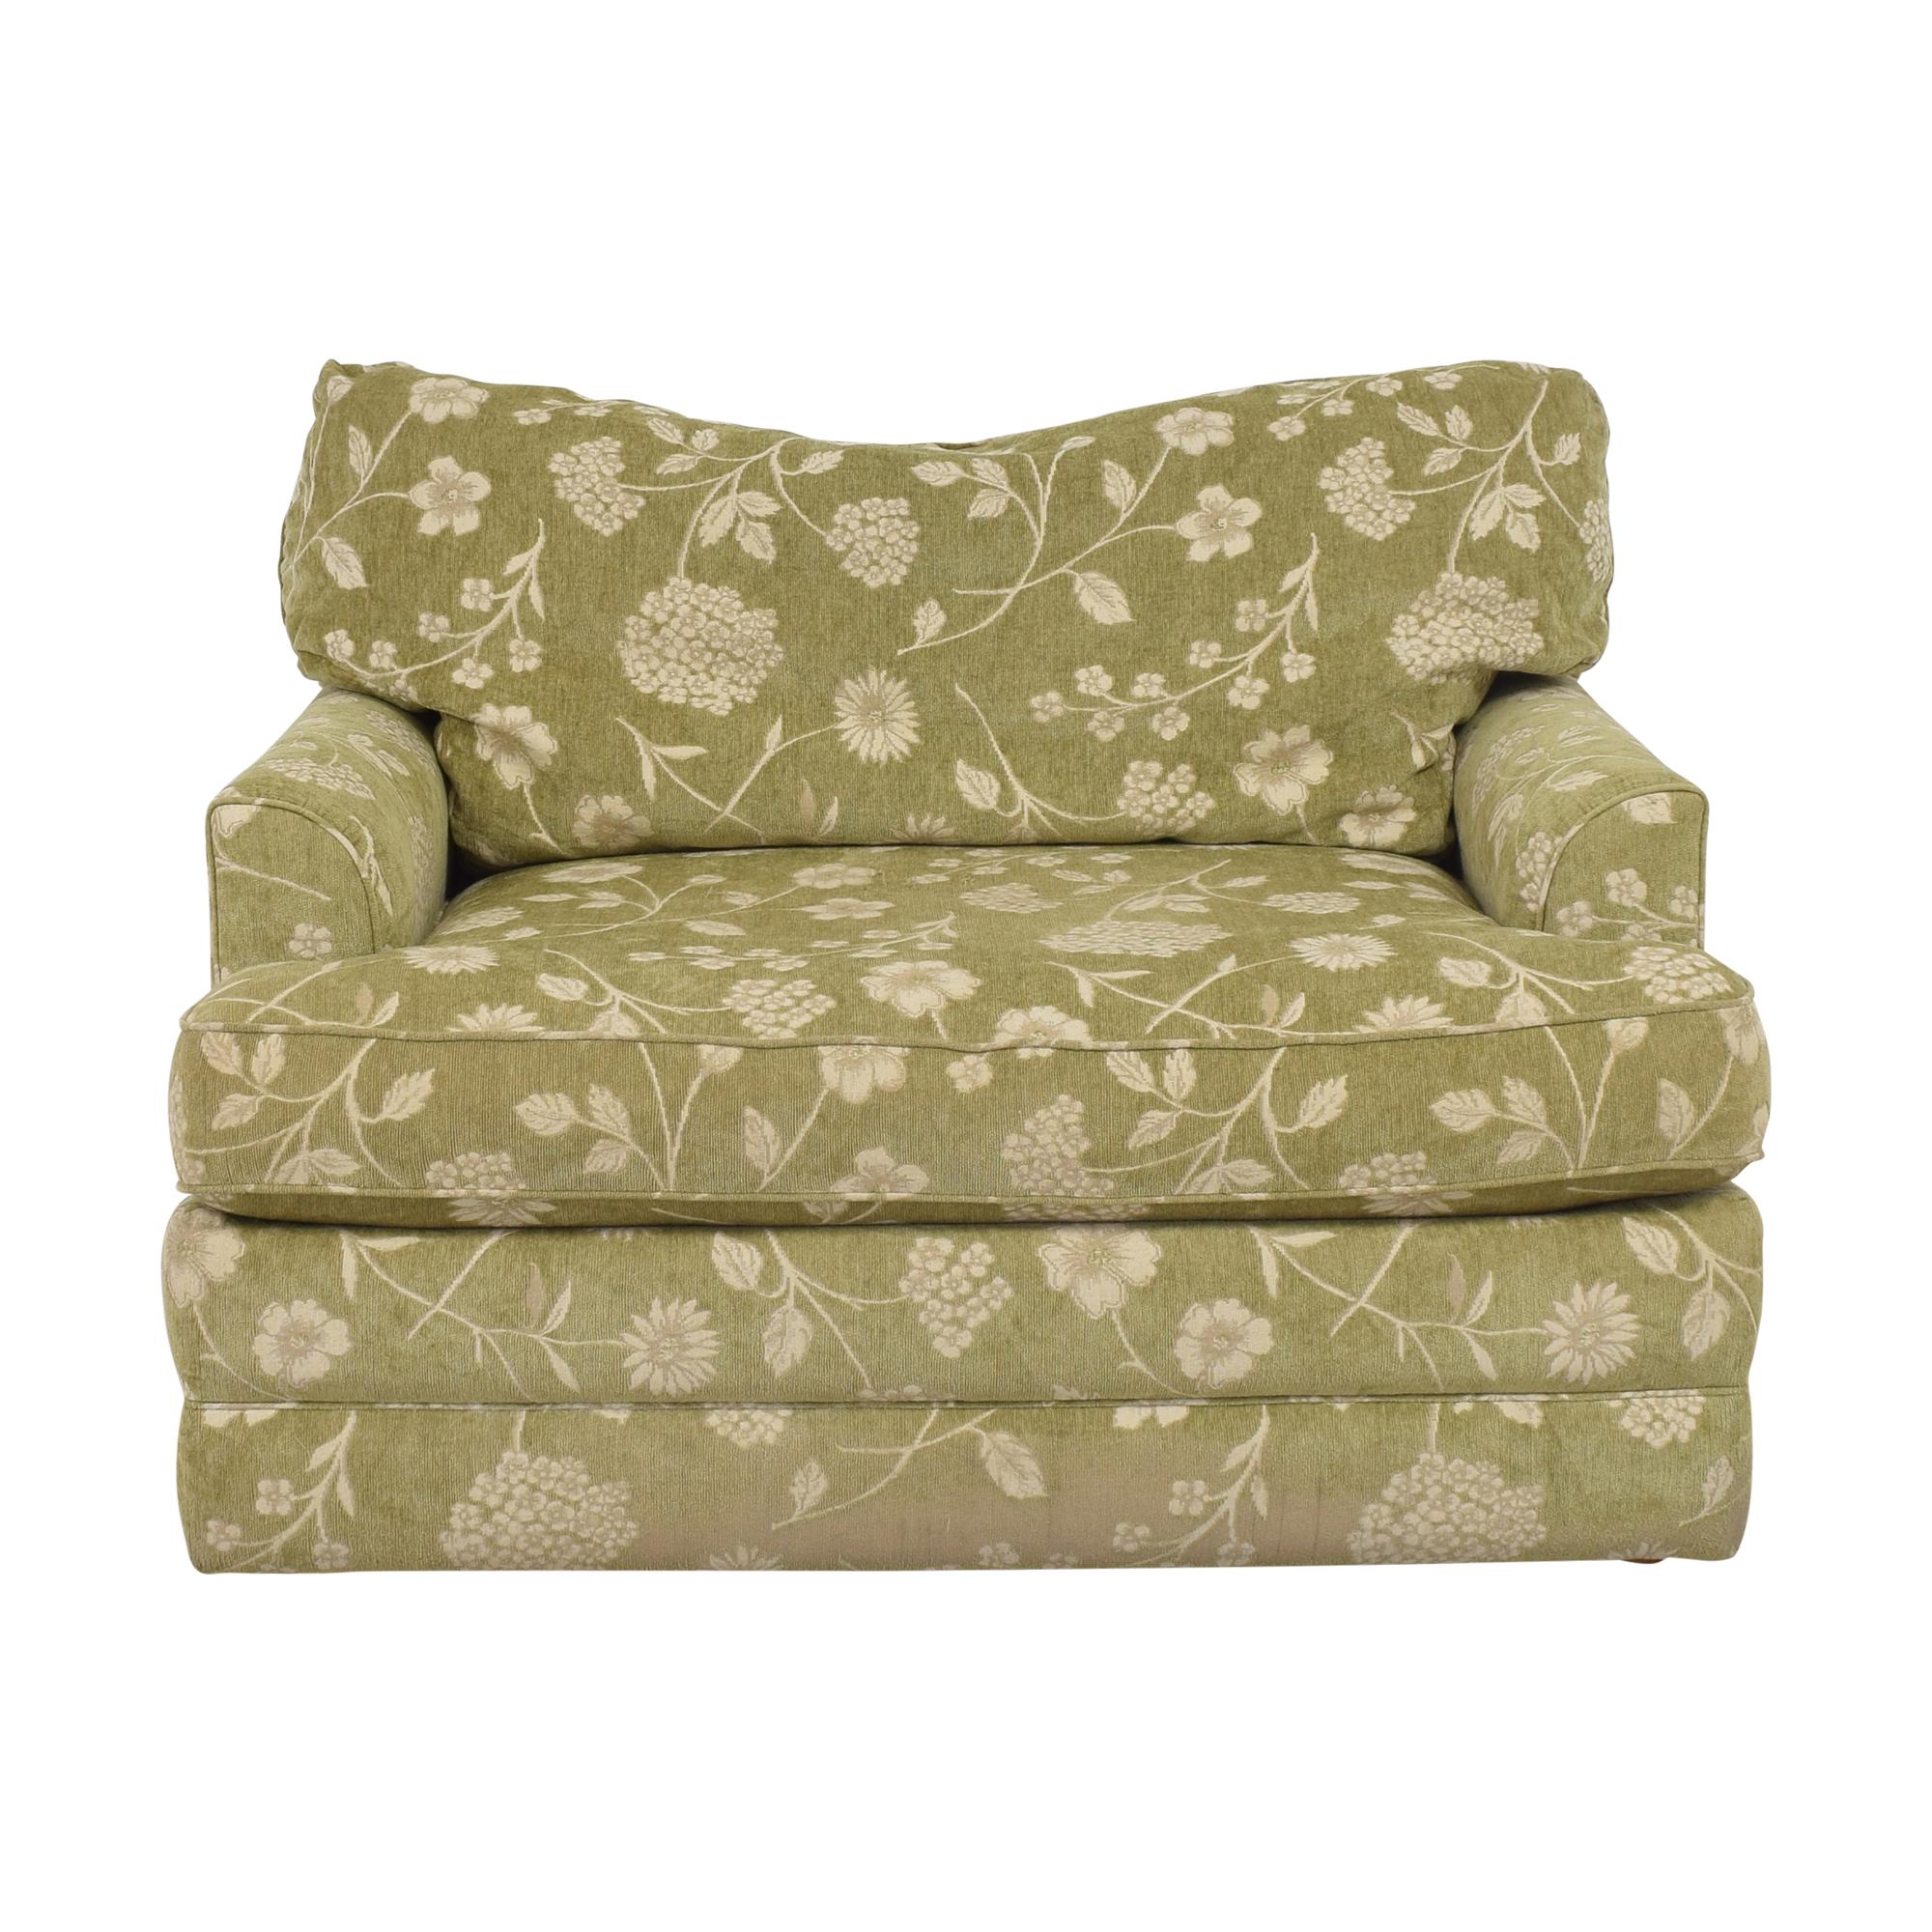 La-Z-Boy La-Z-Boy Sleeper Chair and a Half used